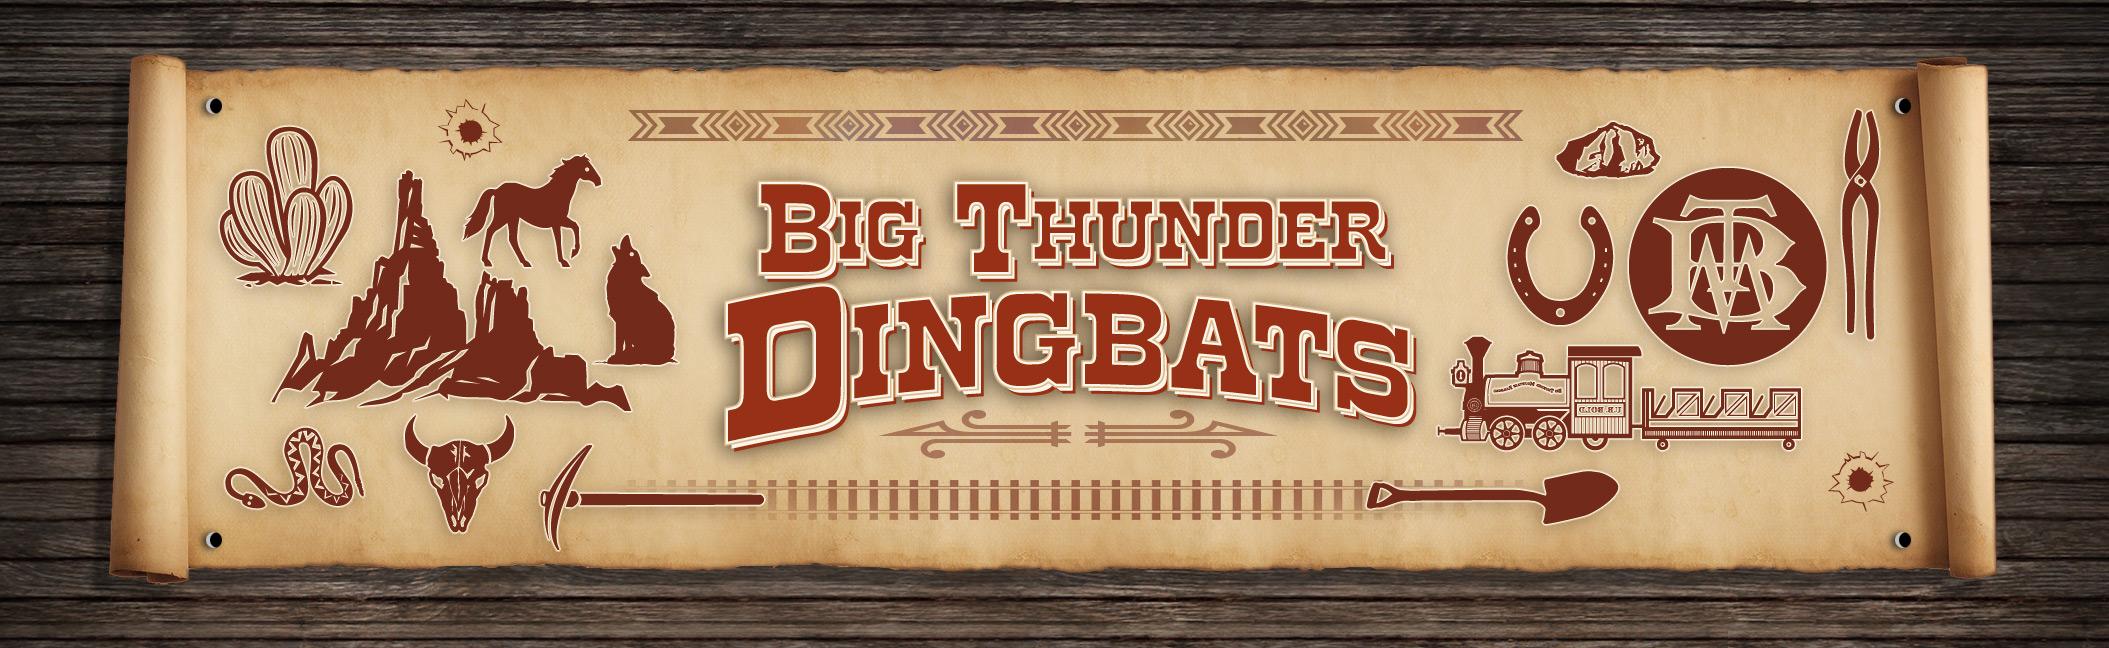 Serene Free Western Font Big Thunder Dingbats Free Western Font Big Thunder Dingbats From David Occhino Western Font Word Western Fonts Free Download dpreview Old Western Font